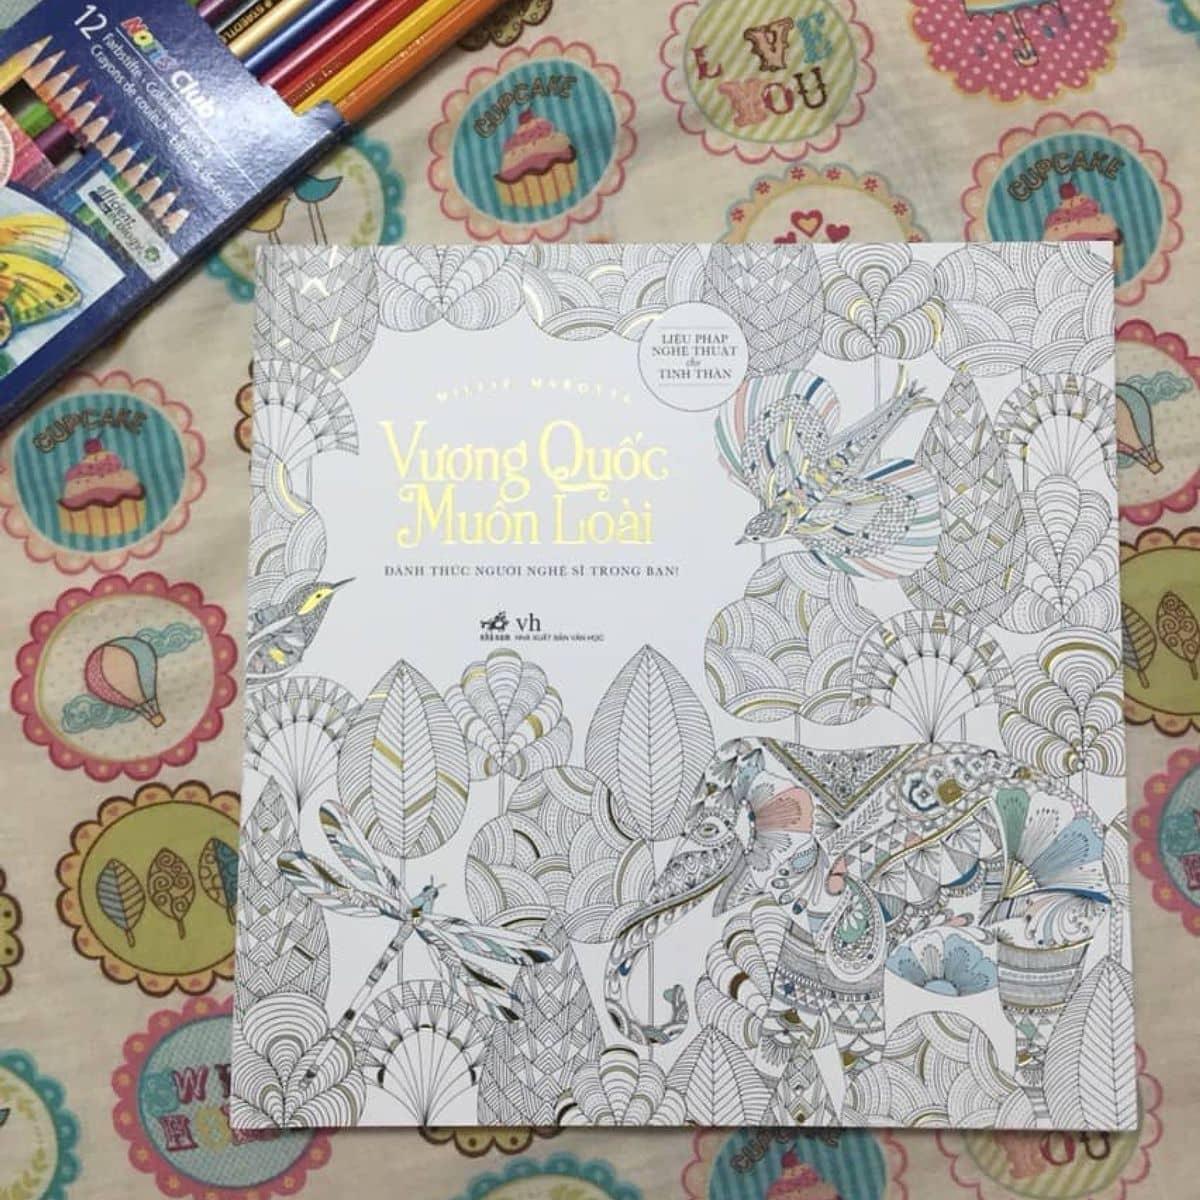 Cunguoimoita Sach To Mau Vuong Quoc Muon Loai Healingbook Coloringbook Sachtomau Tai Minh Chau Cua